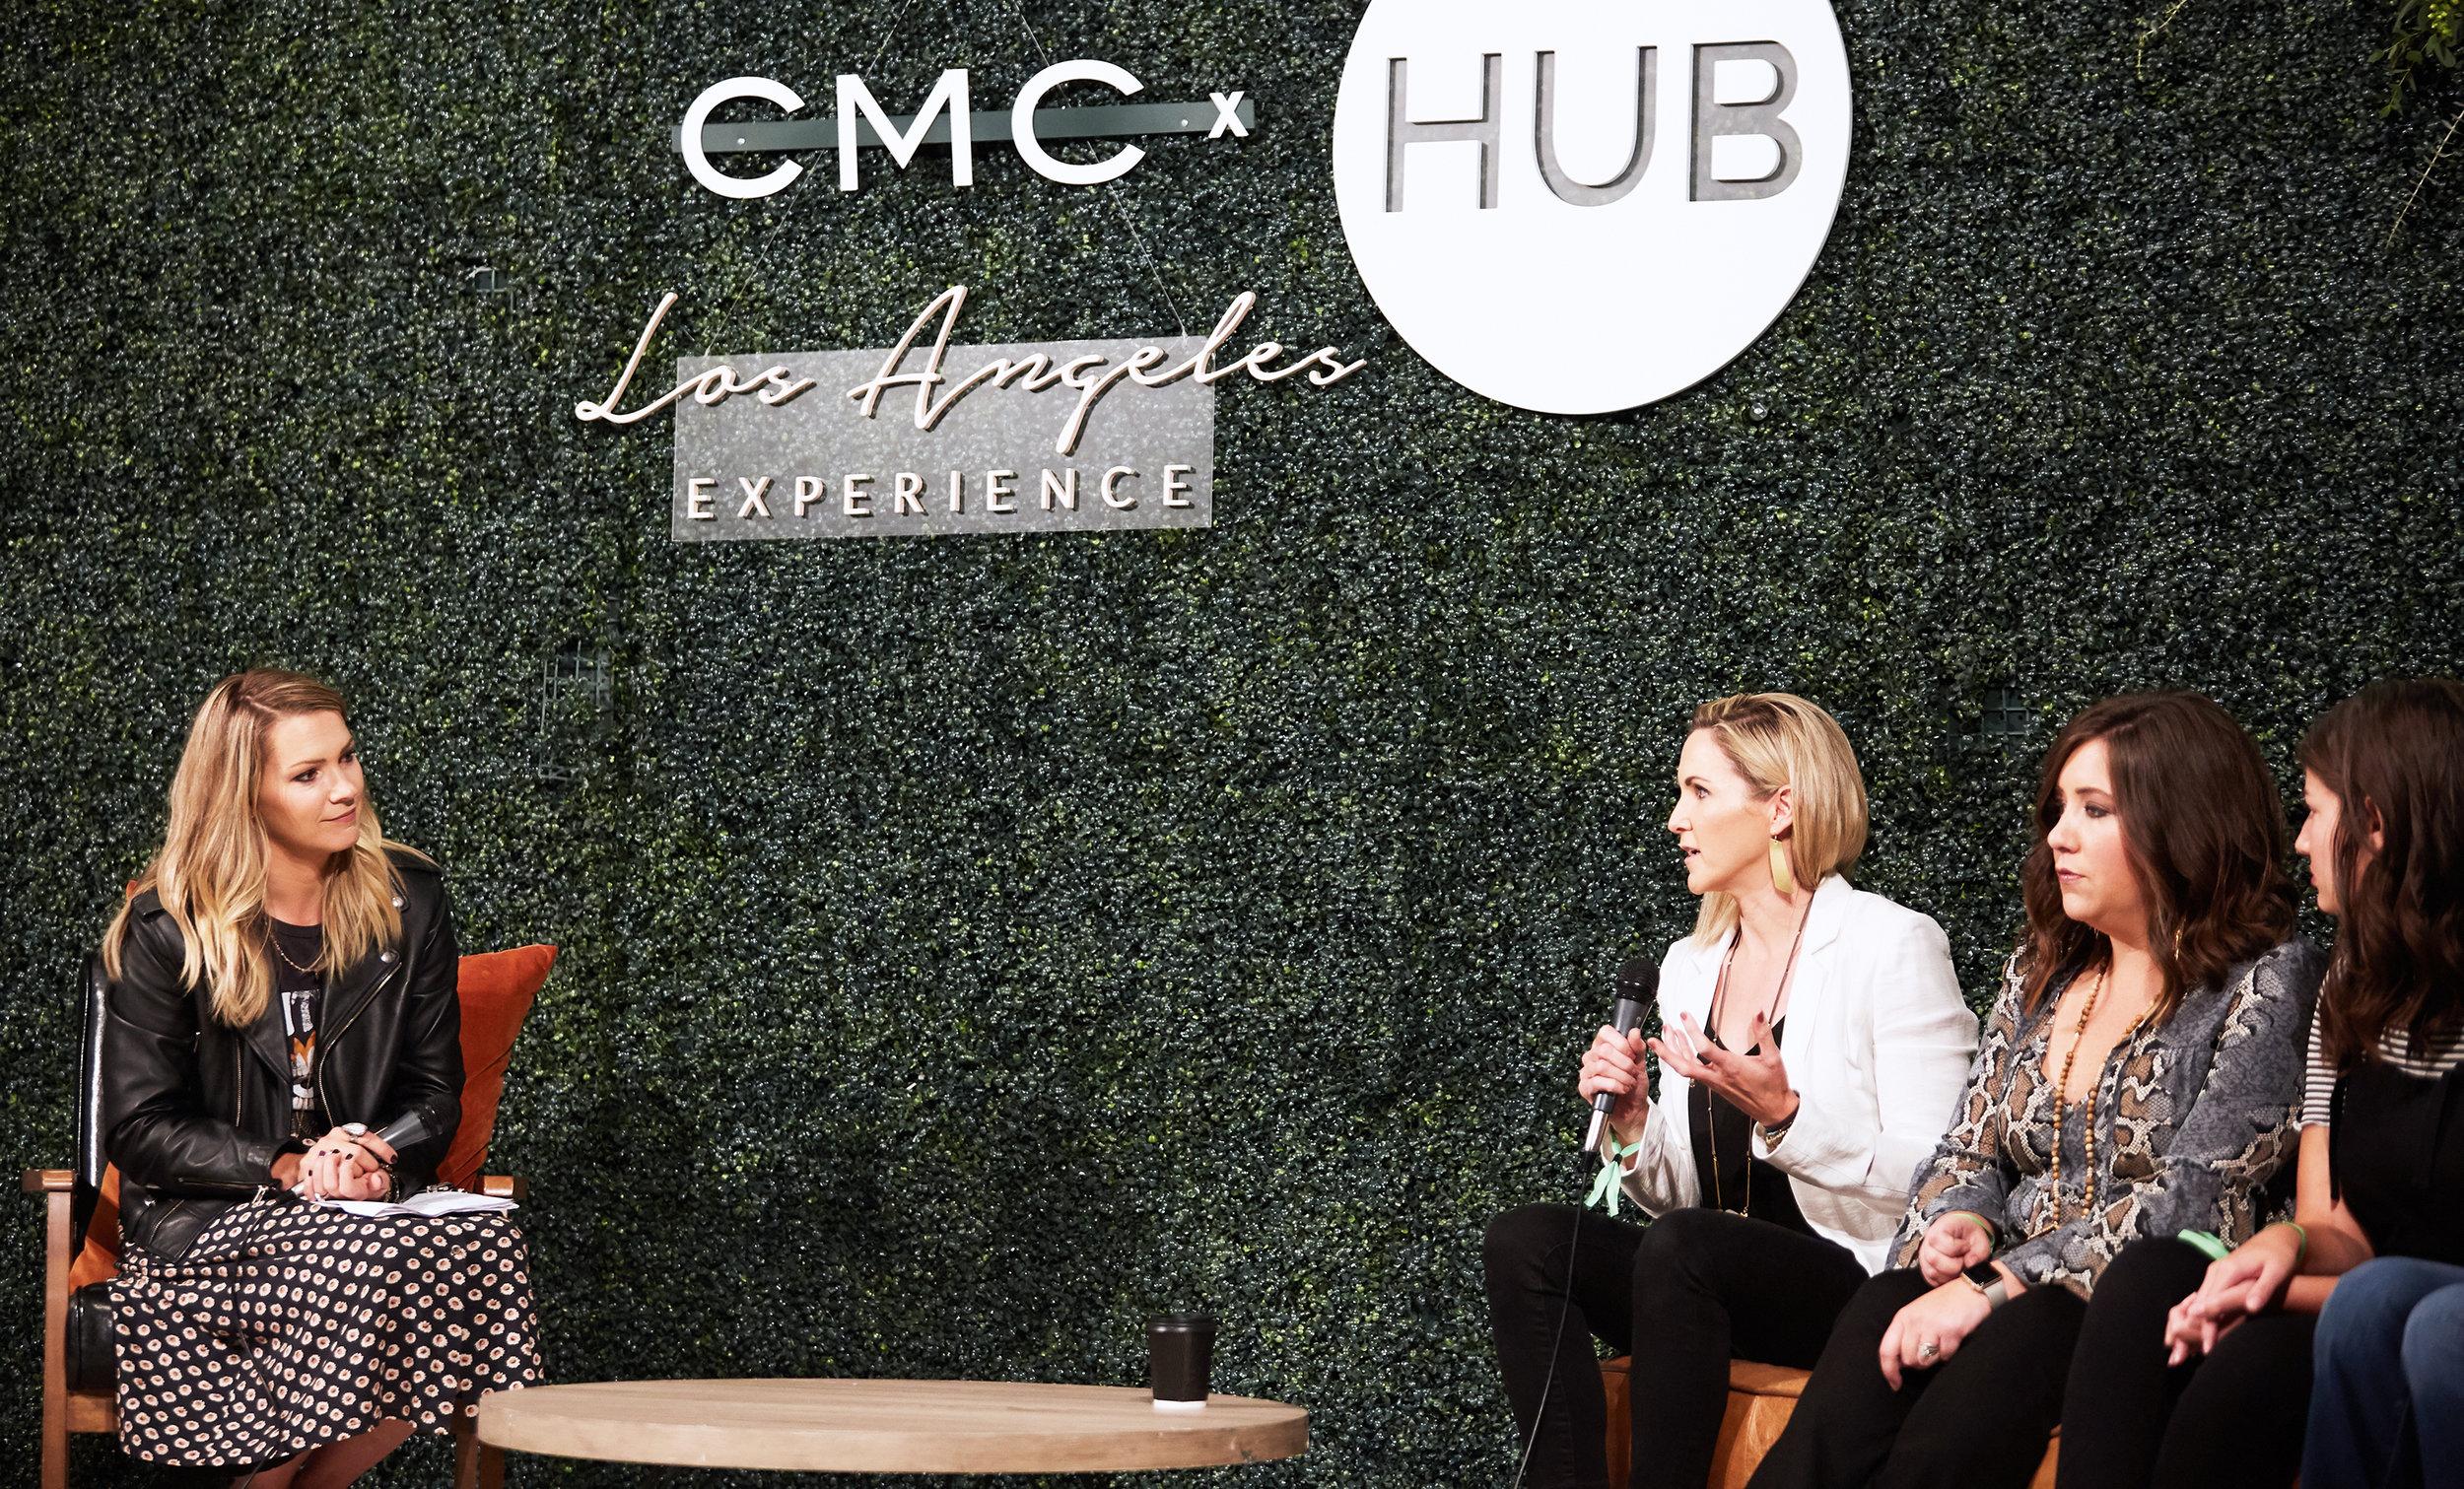 Boutique Hub's LA Experience